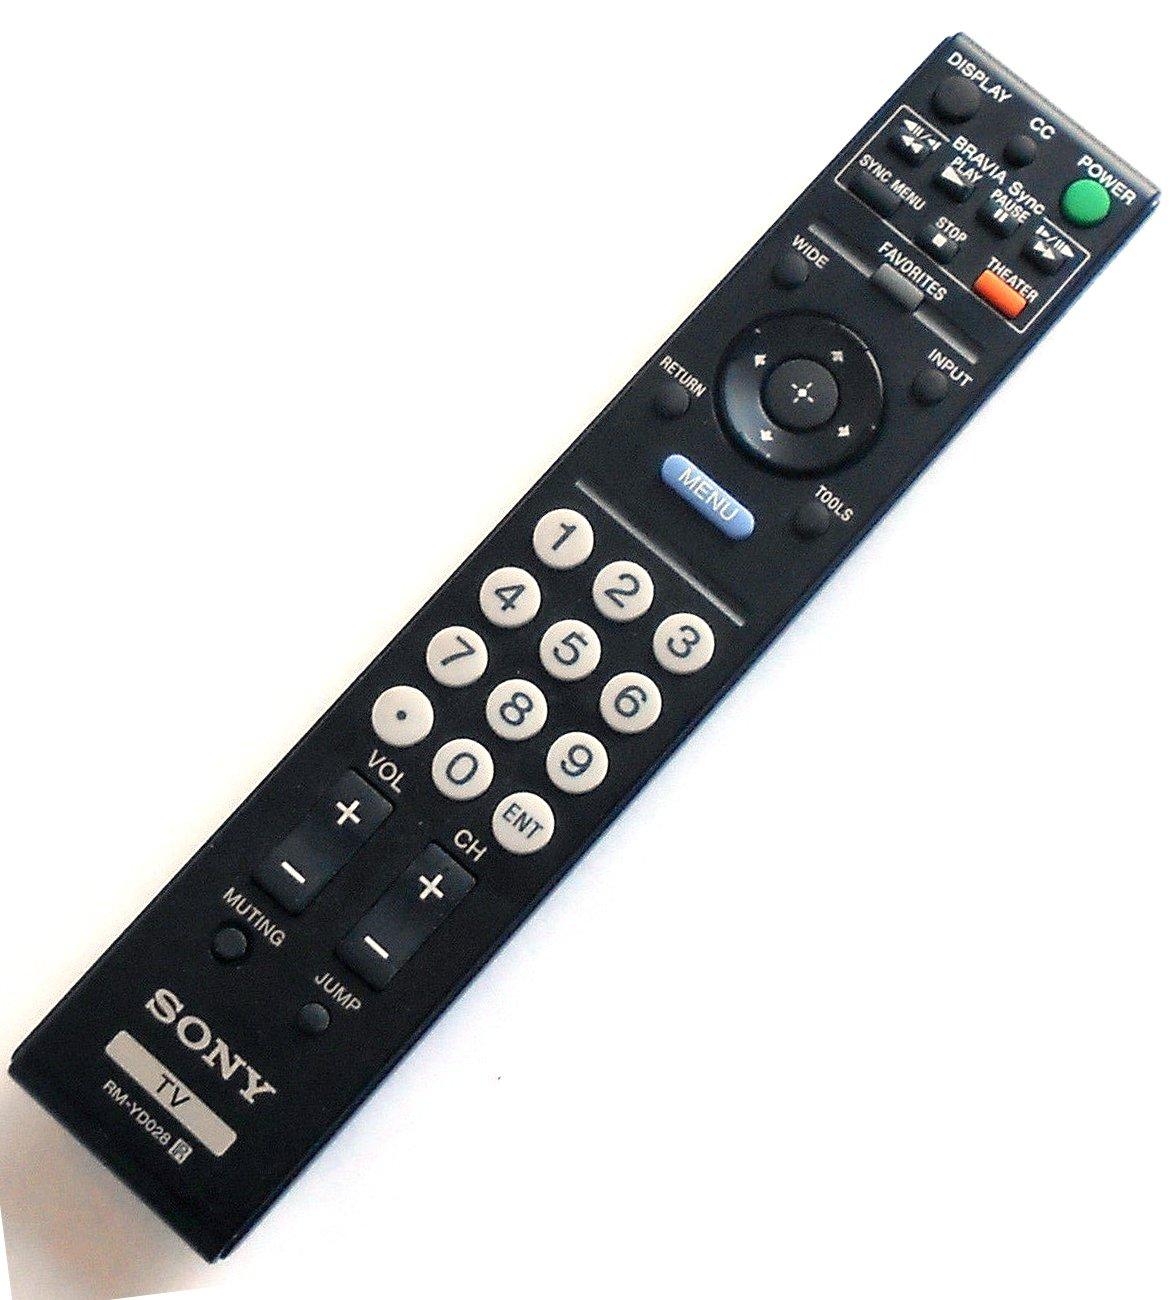 New Replaced RM-YD028 Remote for Sony Bravia KDL-52S5100 KDL32L5000 KDL-52VL150